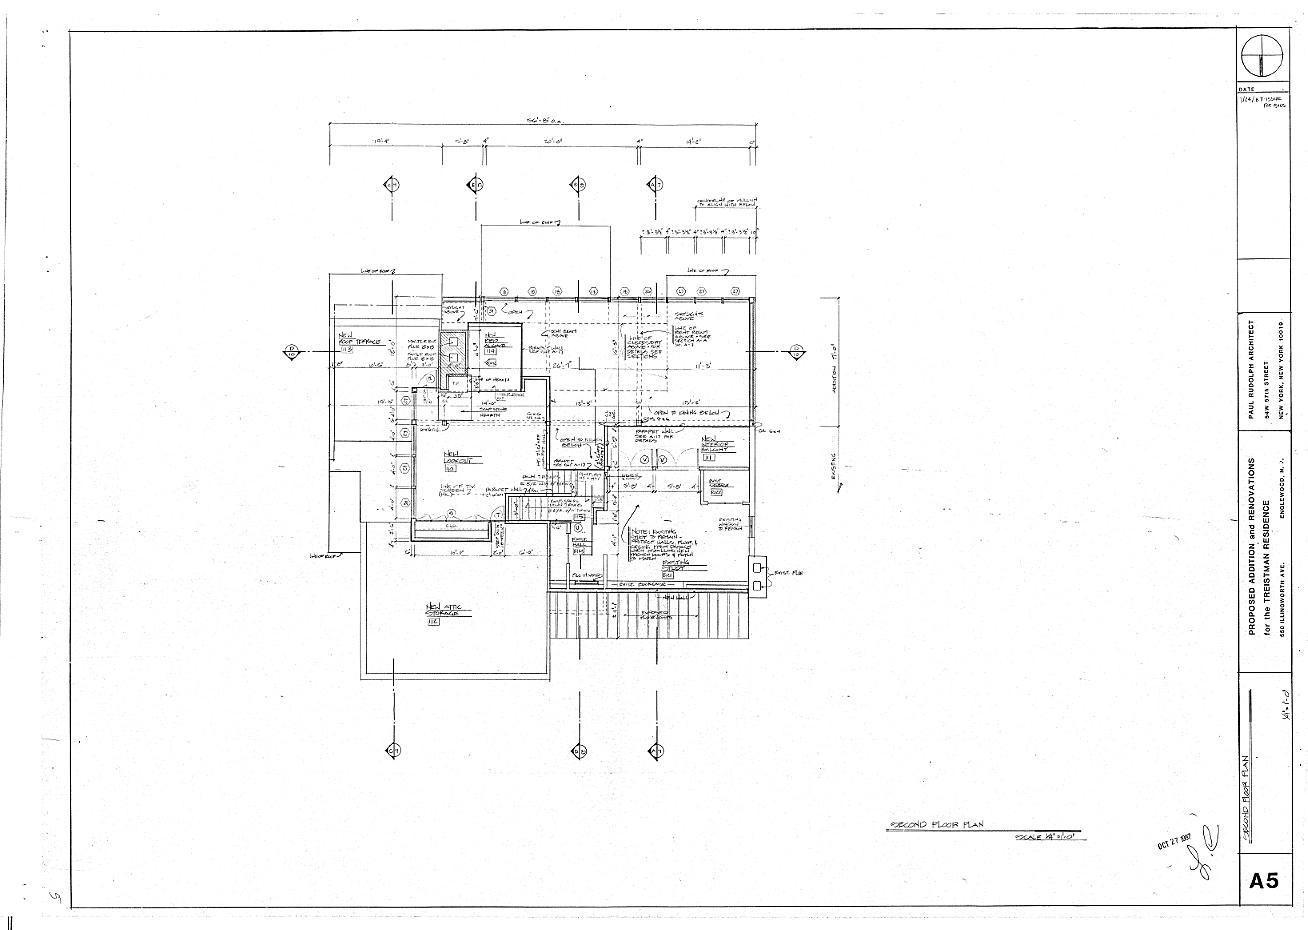 Residence for Mr. and Mrs. Treistman, Englewood, New Jersey. Loft Floor Plan, Sheet A5.